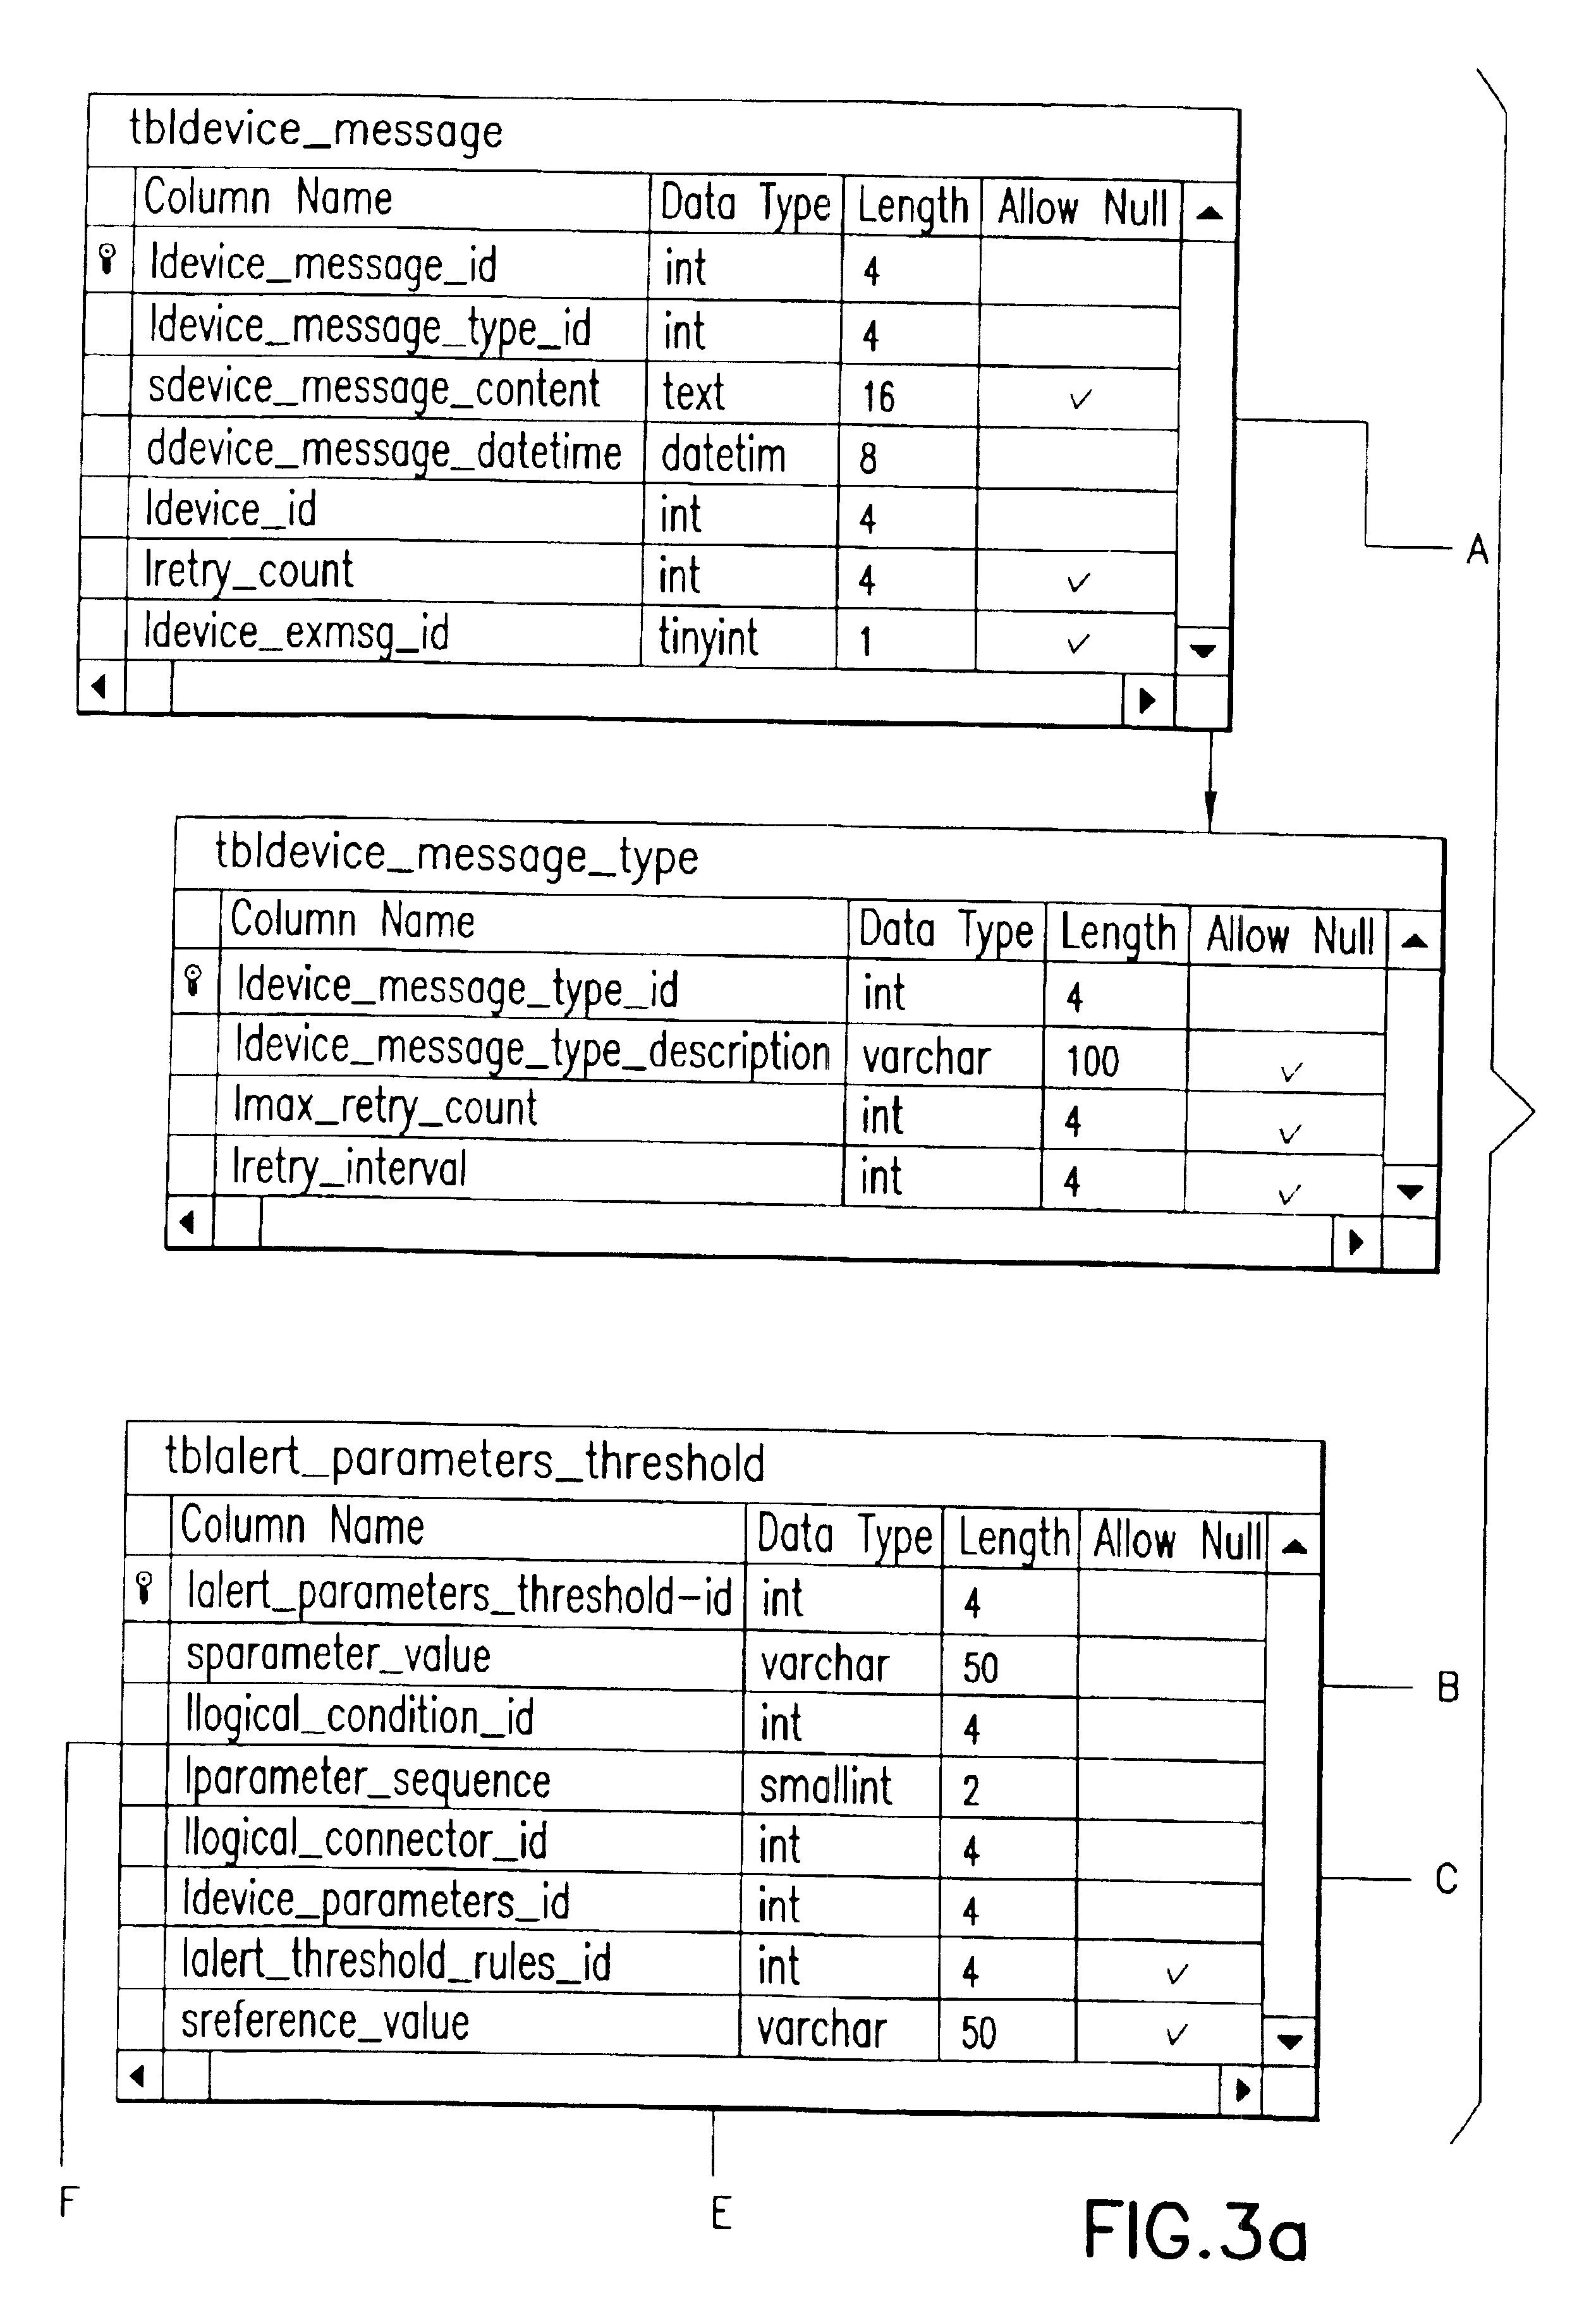 Patent US 6,847,892 B2